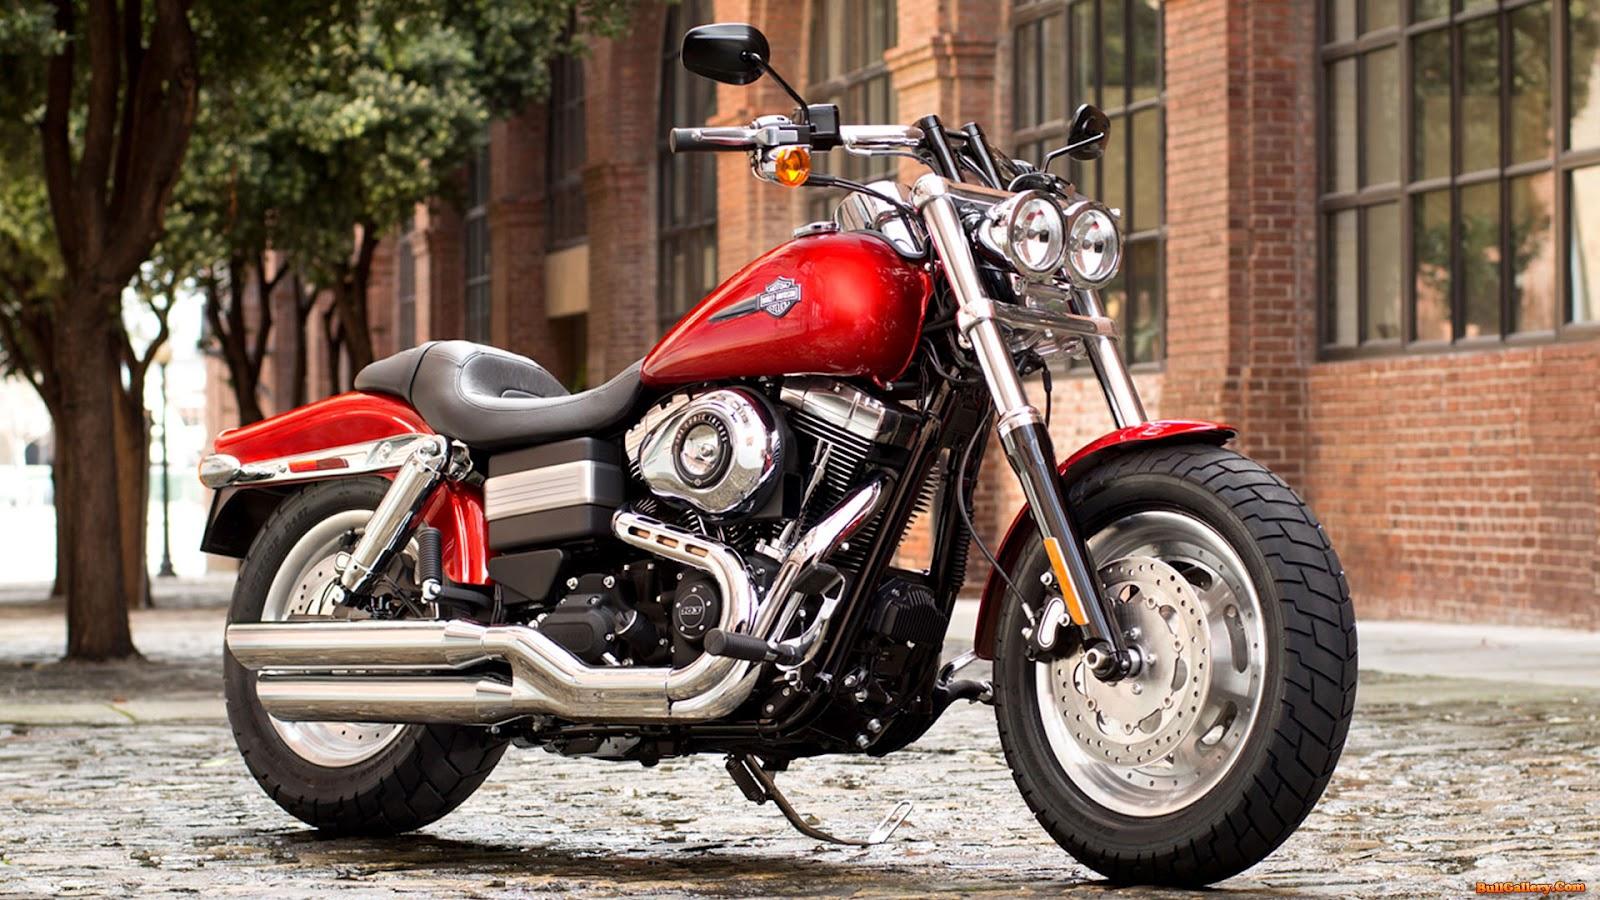 http://1.bp.blogspot.com/-64EGmK3aauk/UHDkt0MqtLI/AAAAAAAAAMk/snPOWm_Kk2w/s1600/Harley-Davidson-FXDF-Dyna-Fat-Bob-2013-Wallpapers-BullGallery.Com.jpg